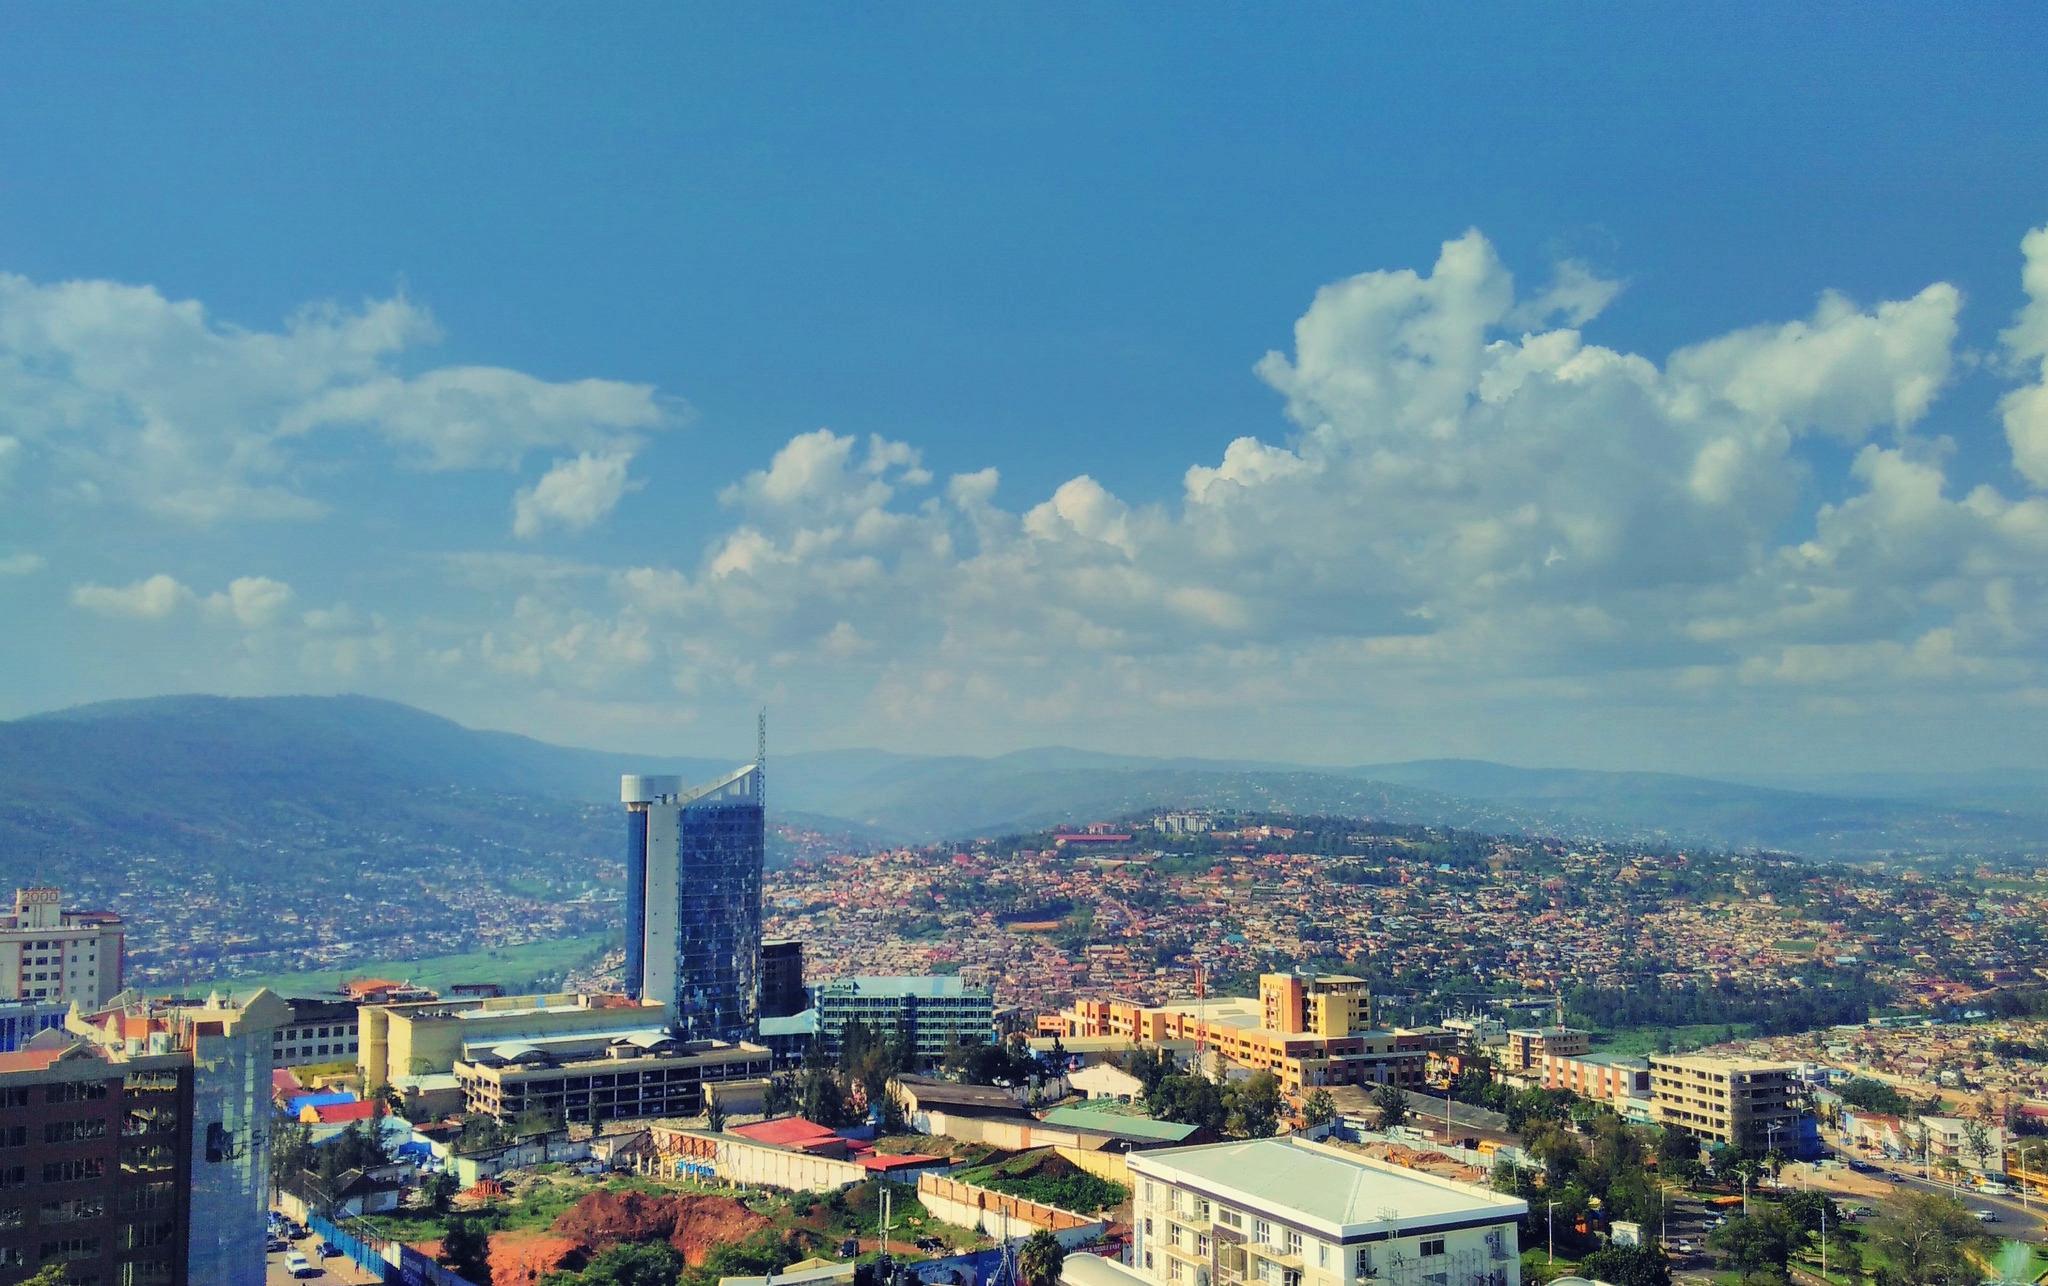 Ruanda das Singapur von Afrika?